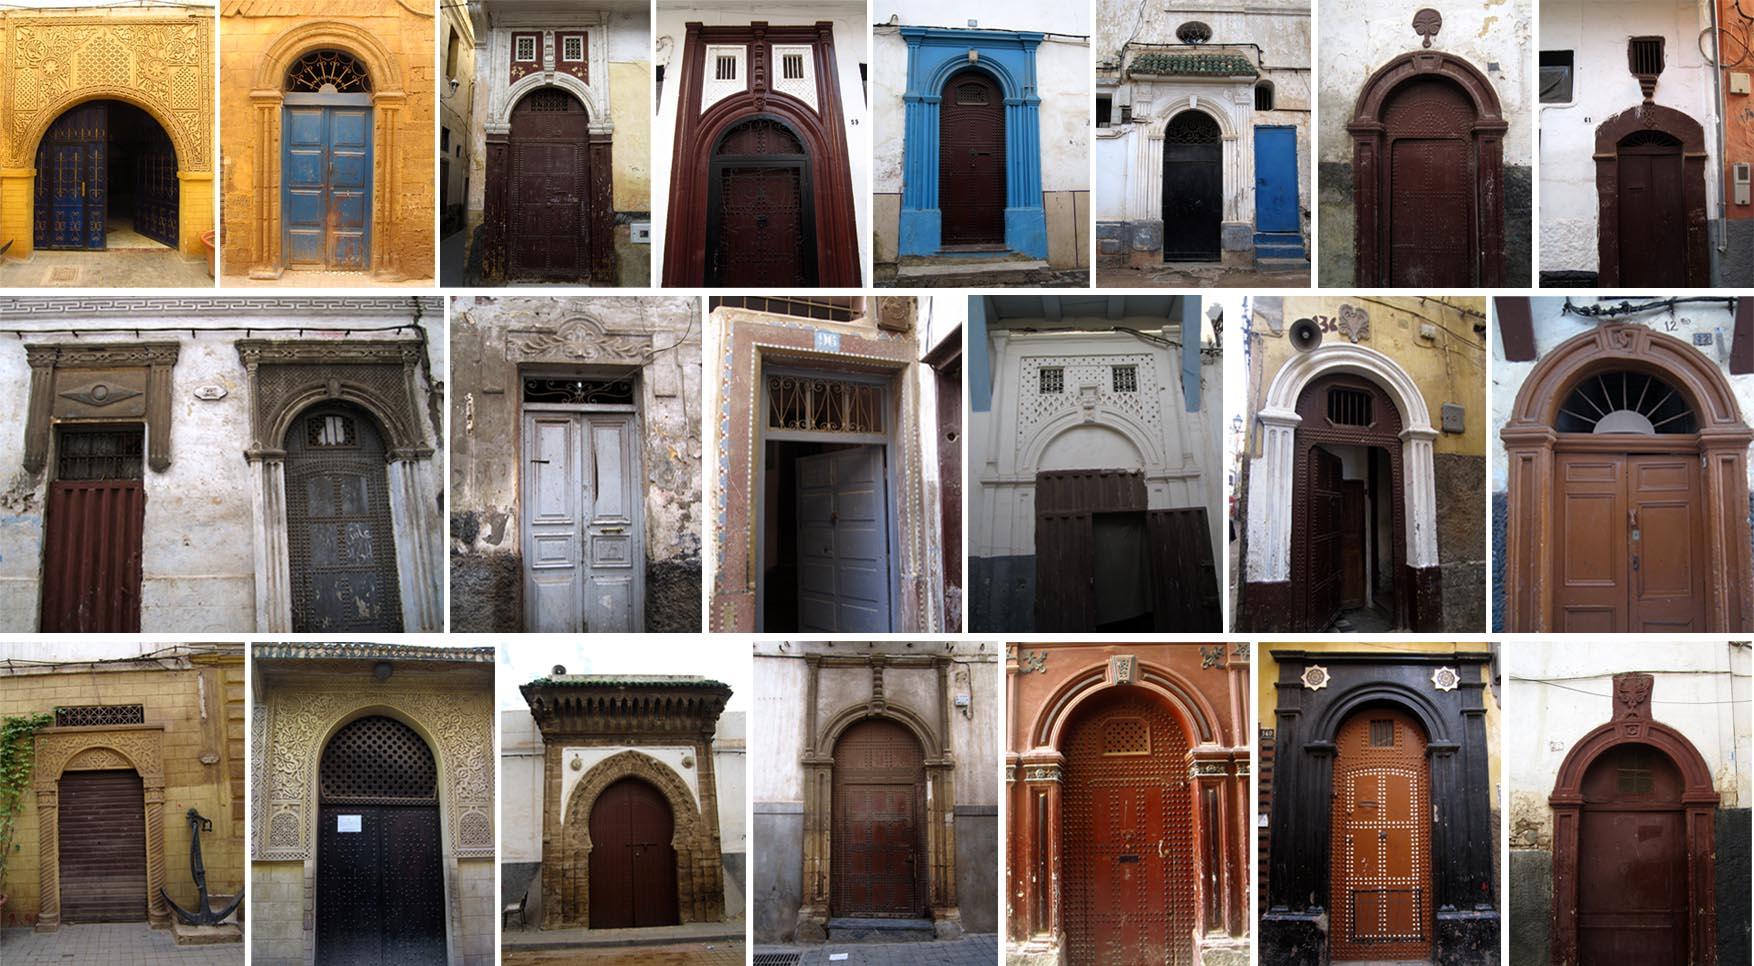 45 maroko kazablanka medina sva vrata